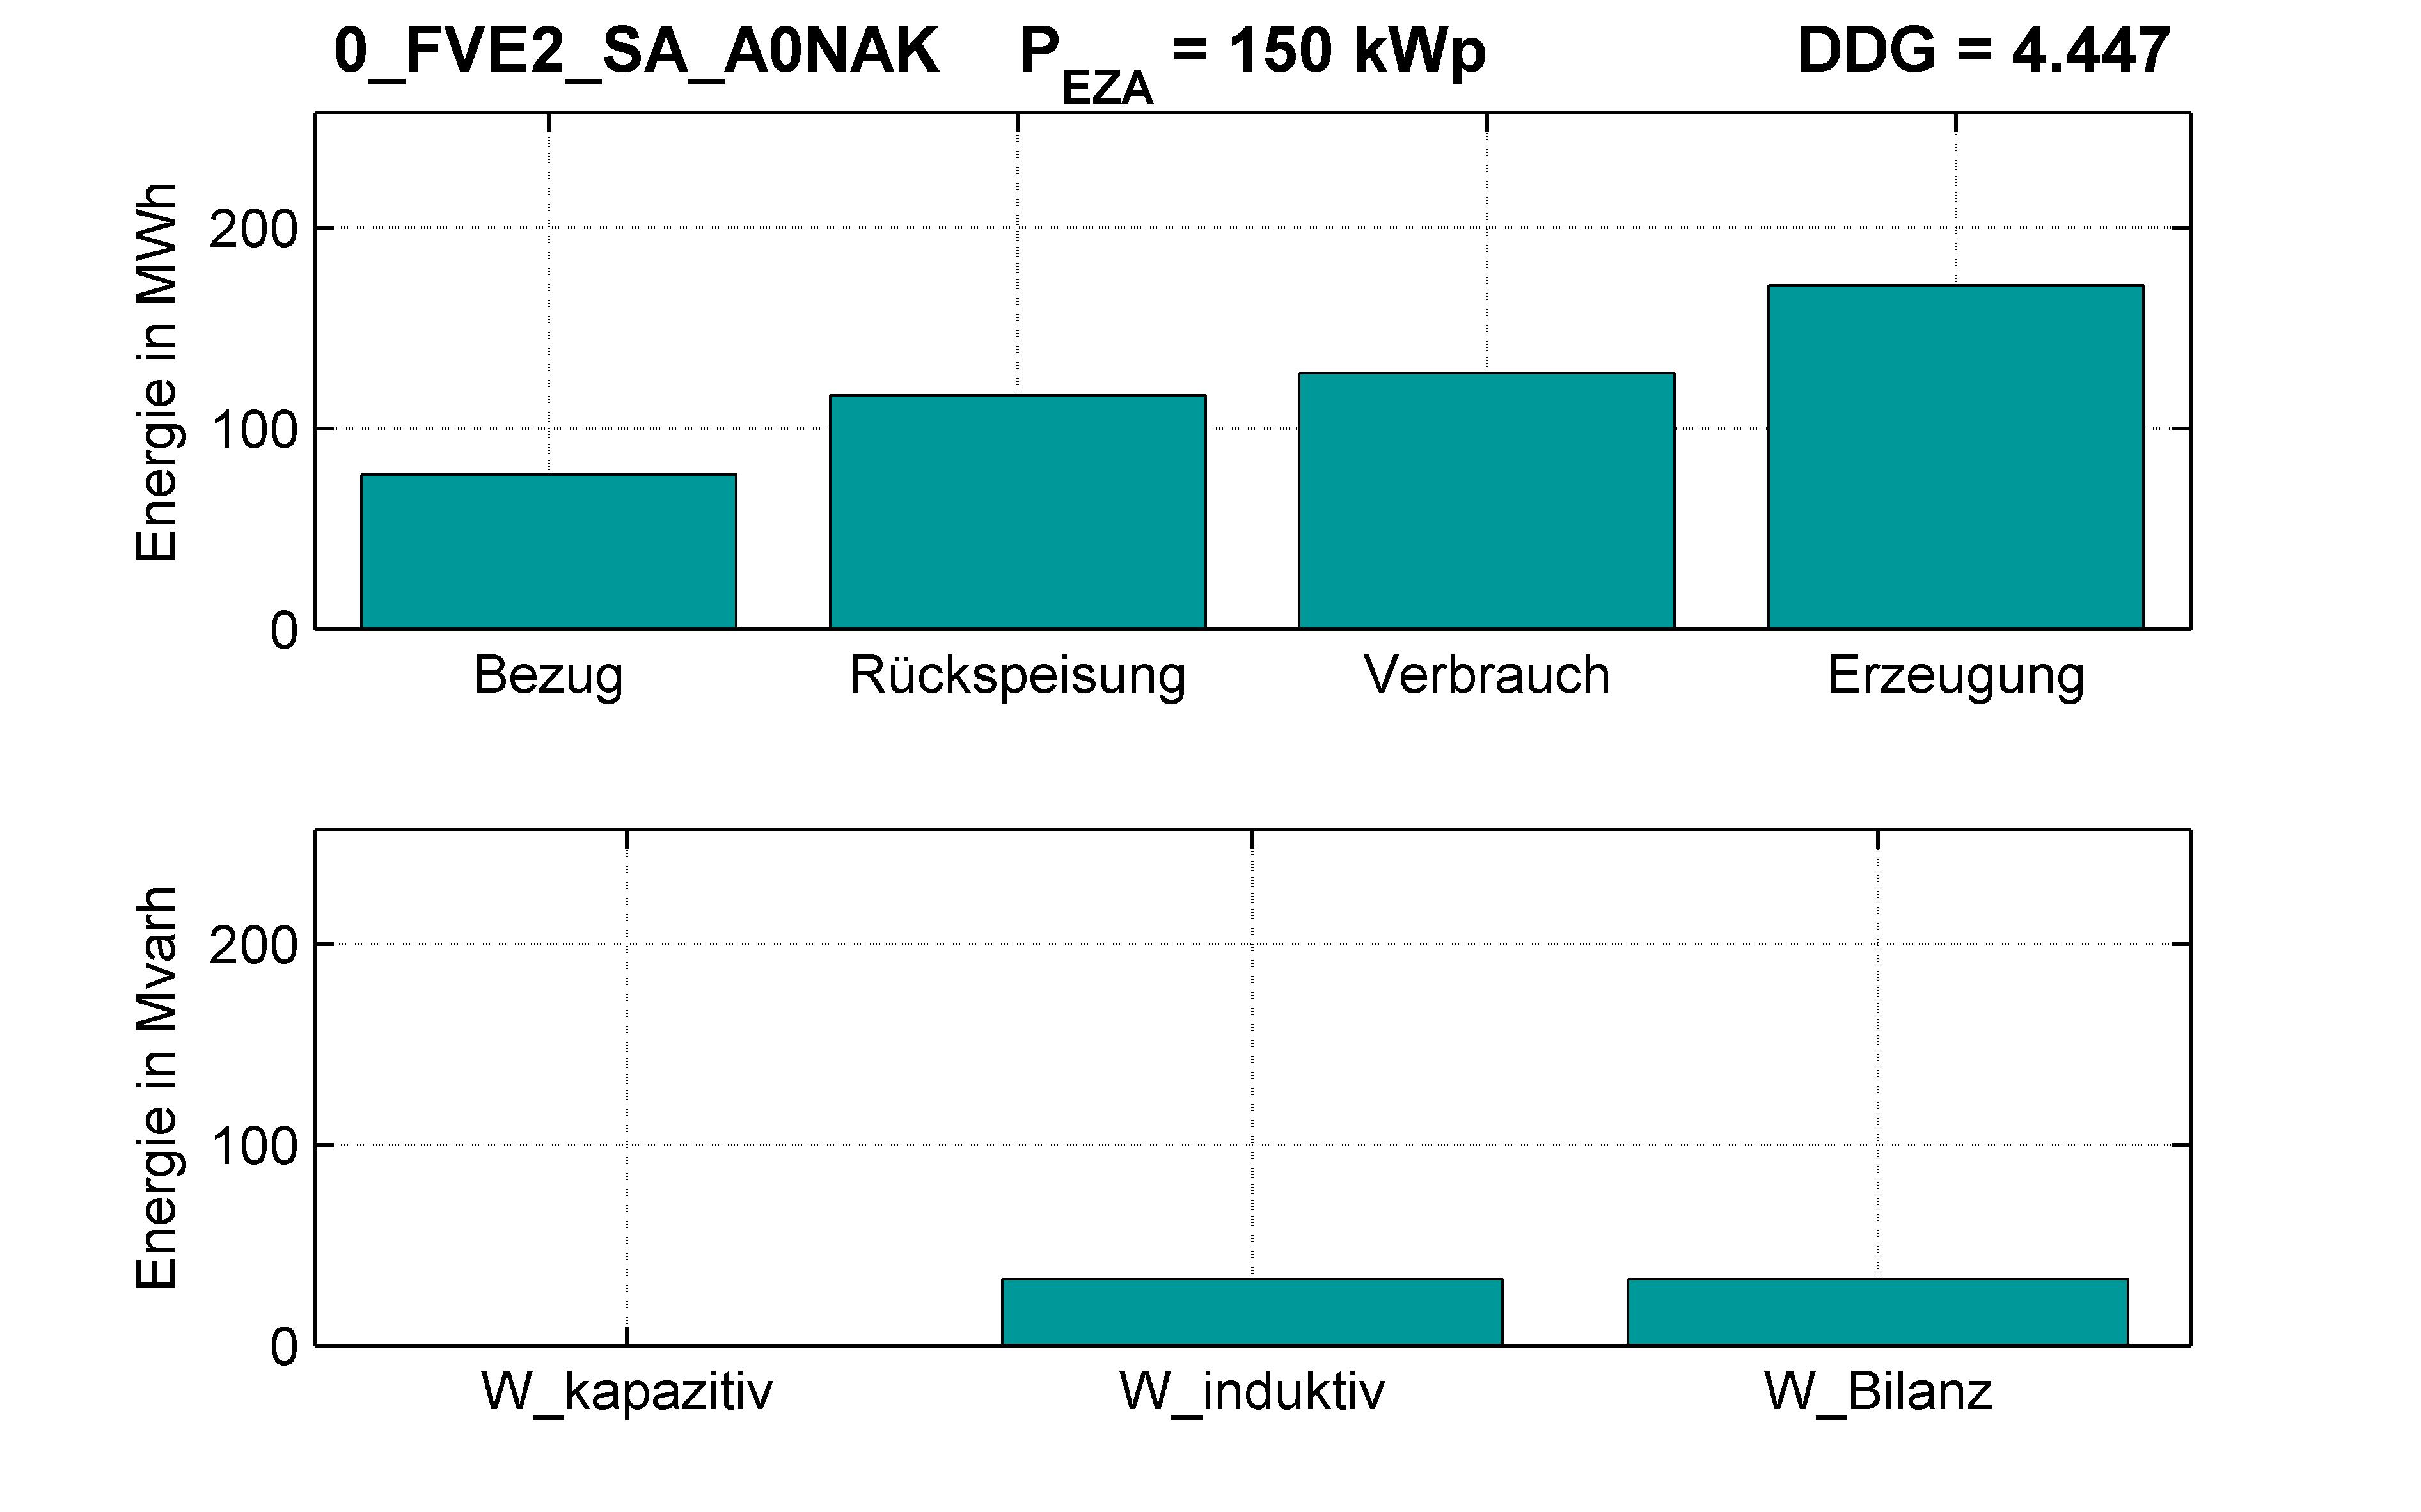 FVE2 | RONT (SA) A0NAK | PQ-Bilanz